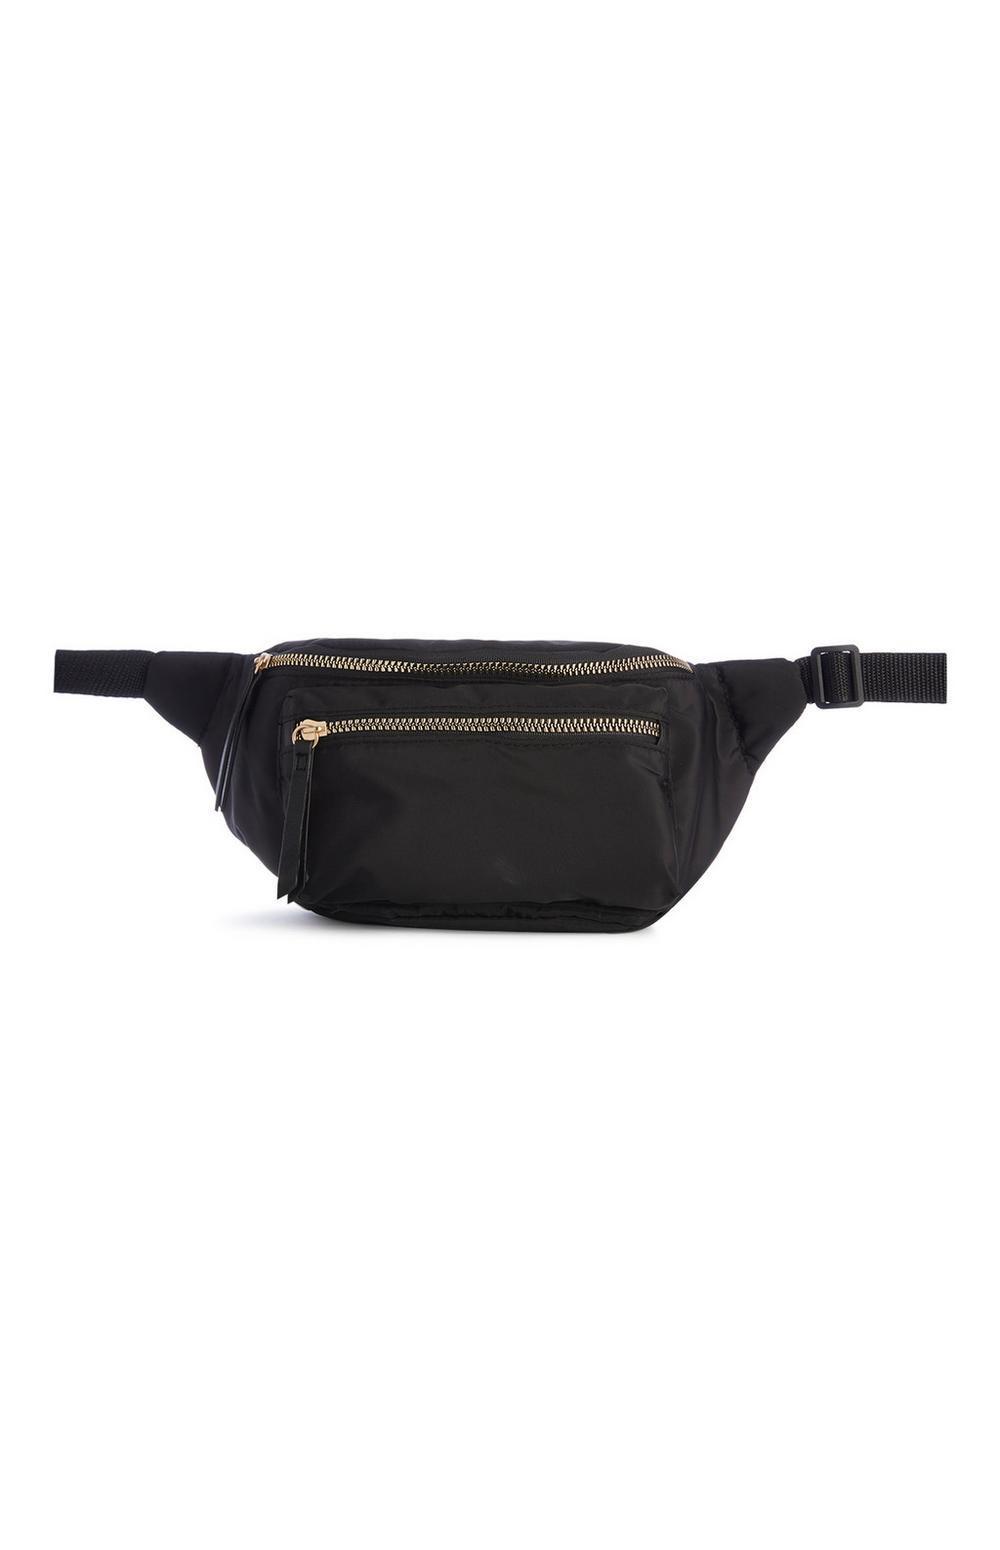 Black Nylon Bum Bag